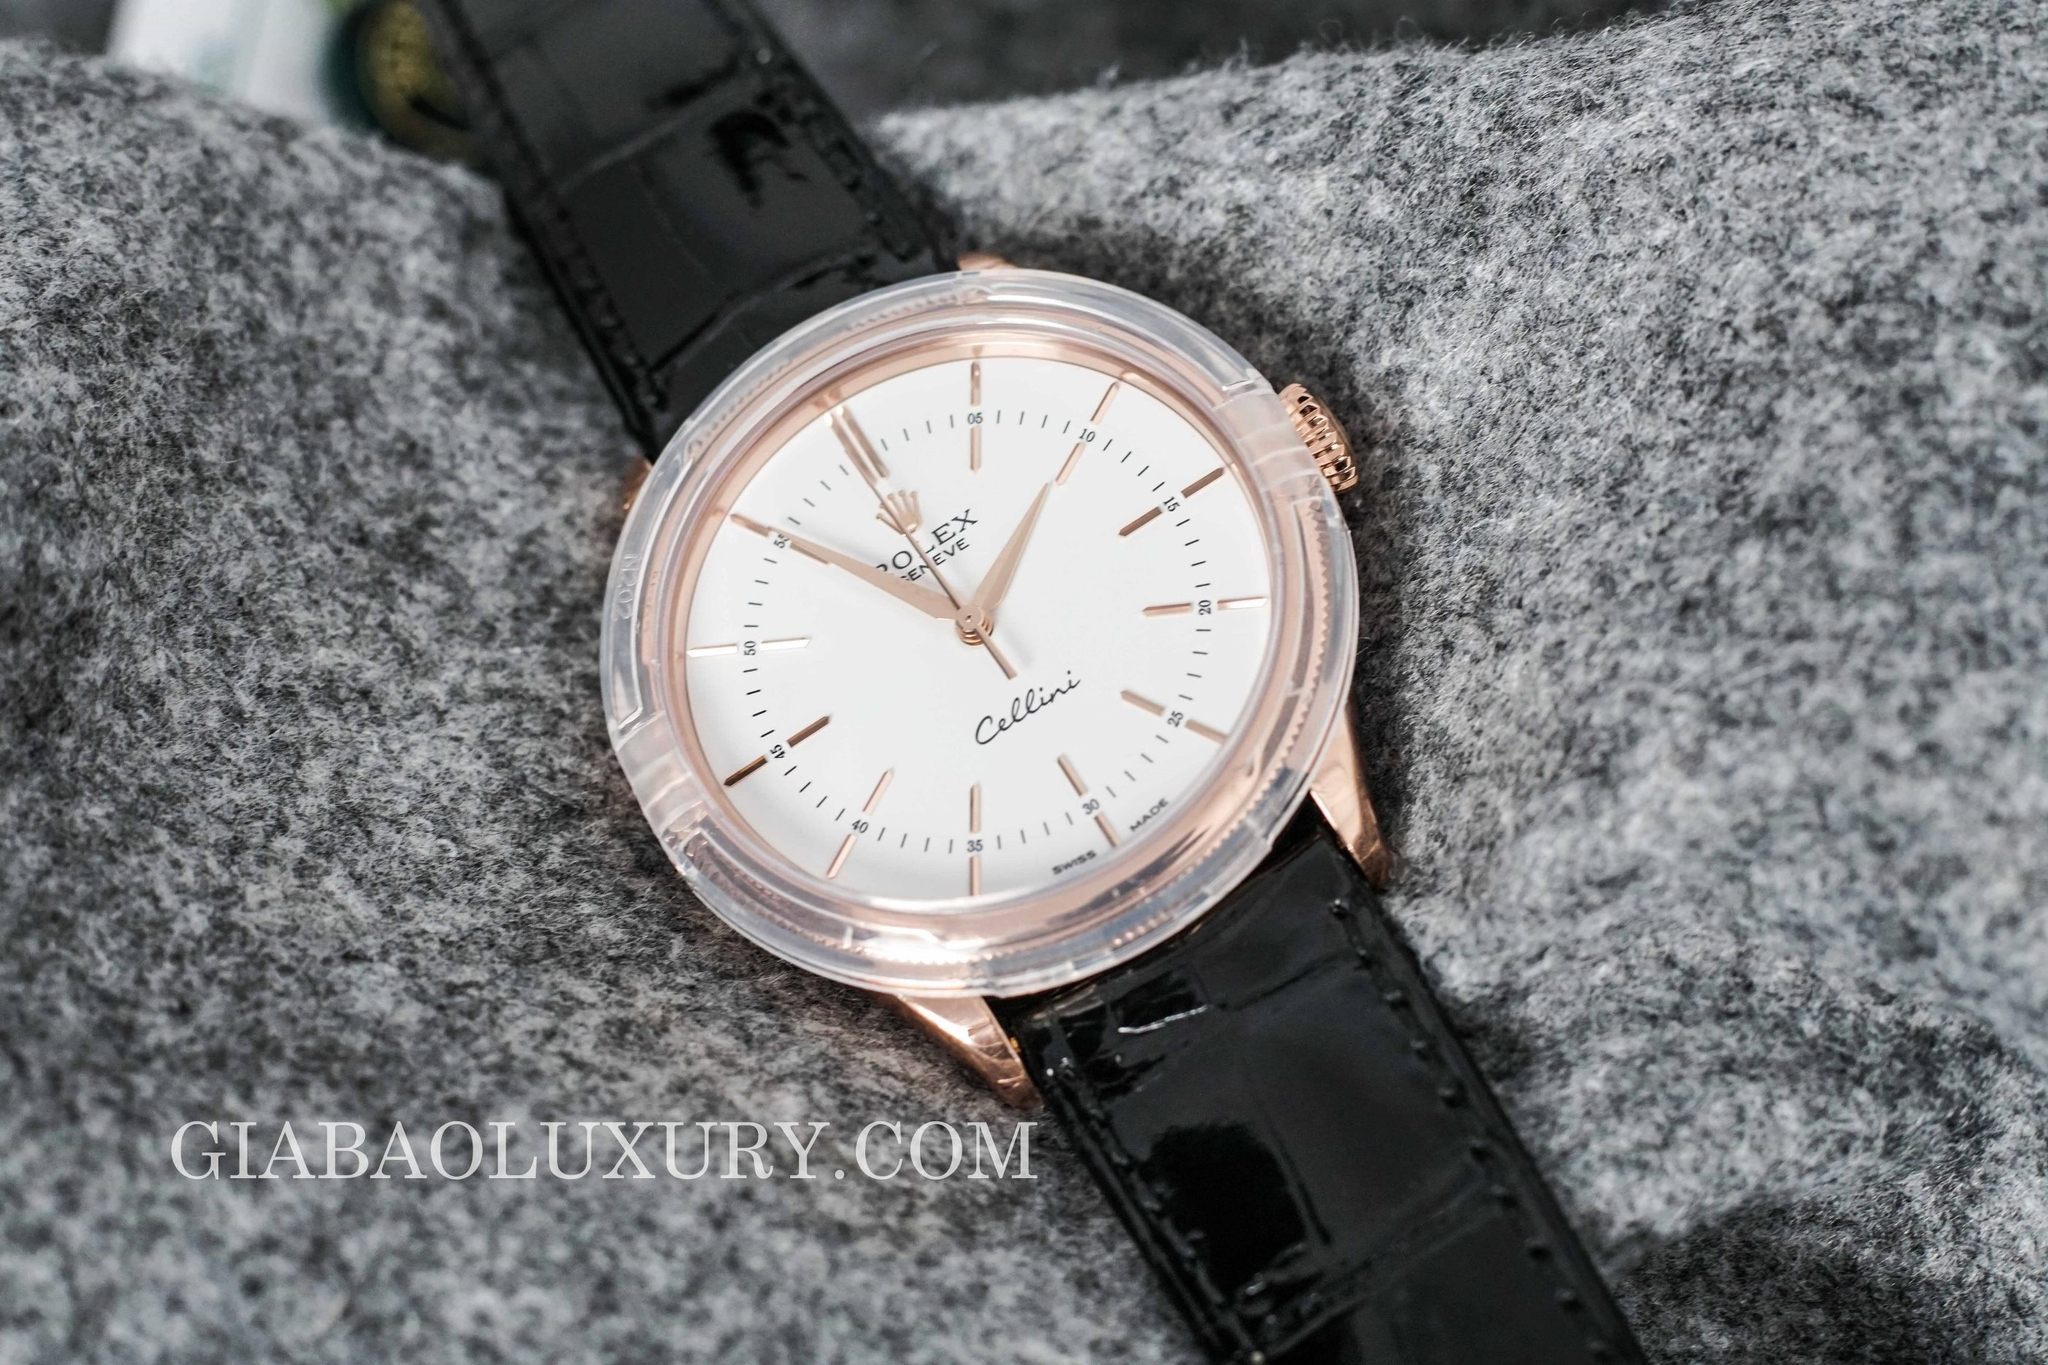 đồng hồ rolex cellini 50505